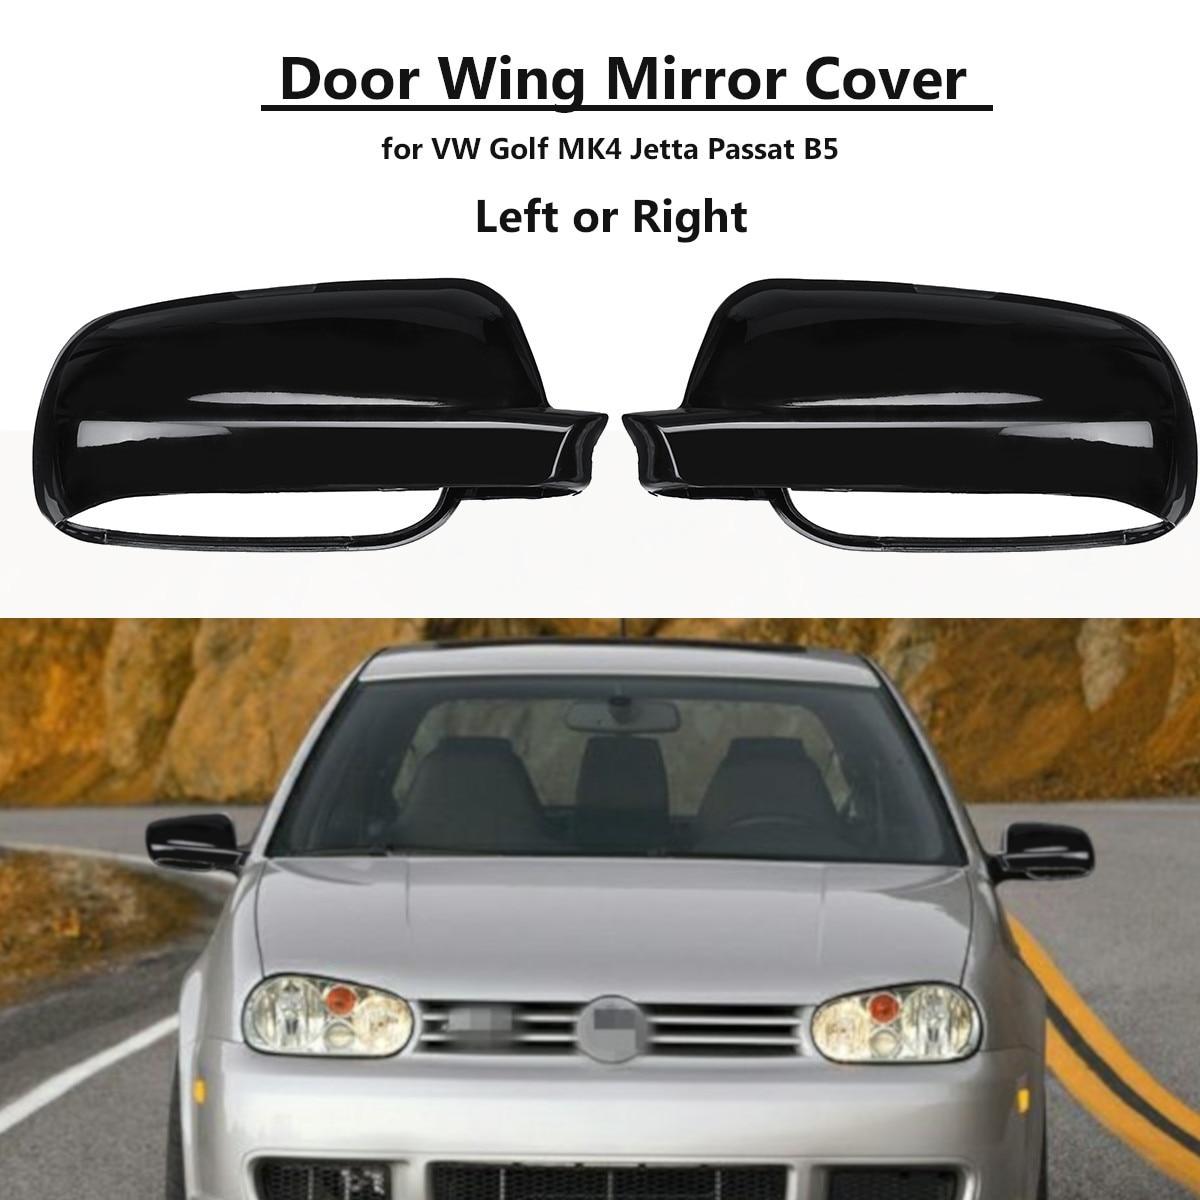 Gloss Black Wing Mirror Cover Cup Left/Right For VW Jetta Bora Golf Mk4 Polo Passat B5 1996-1999 2000 2001 2002 2003 2004